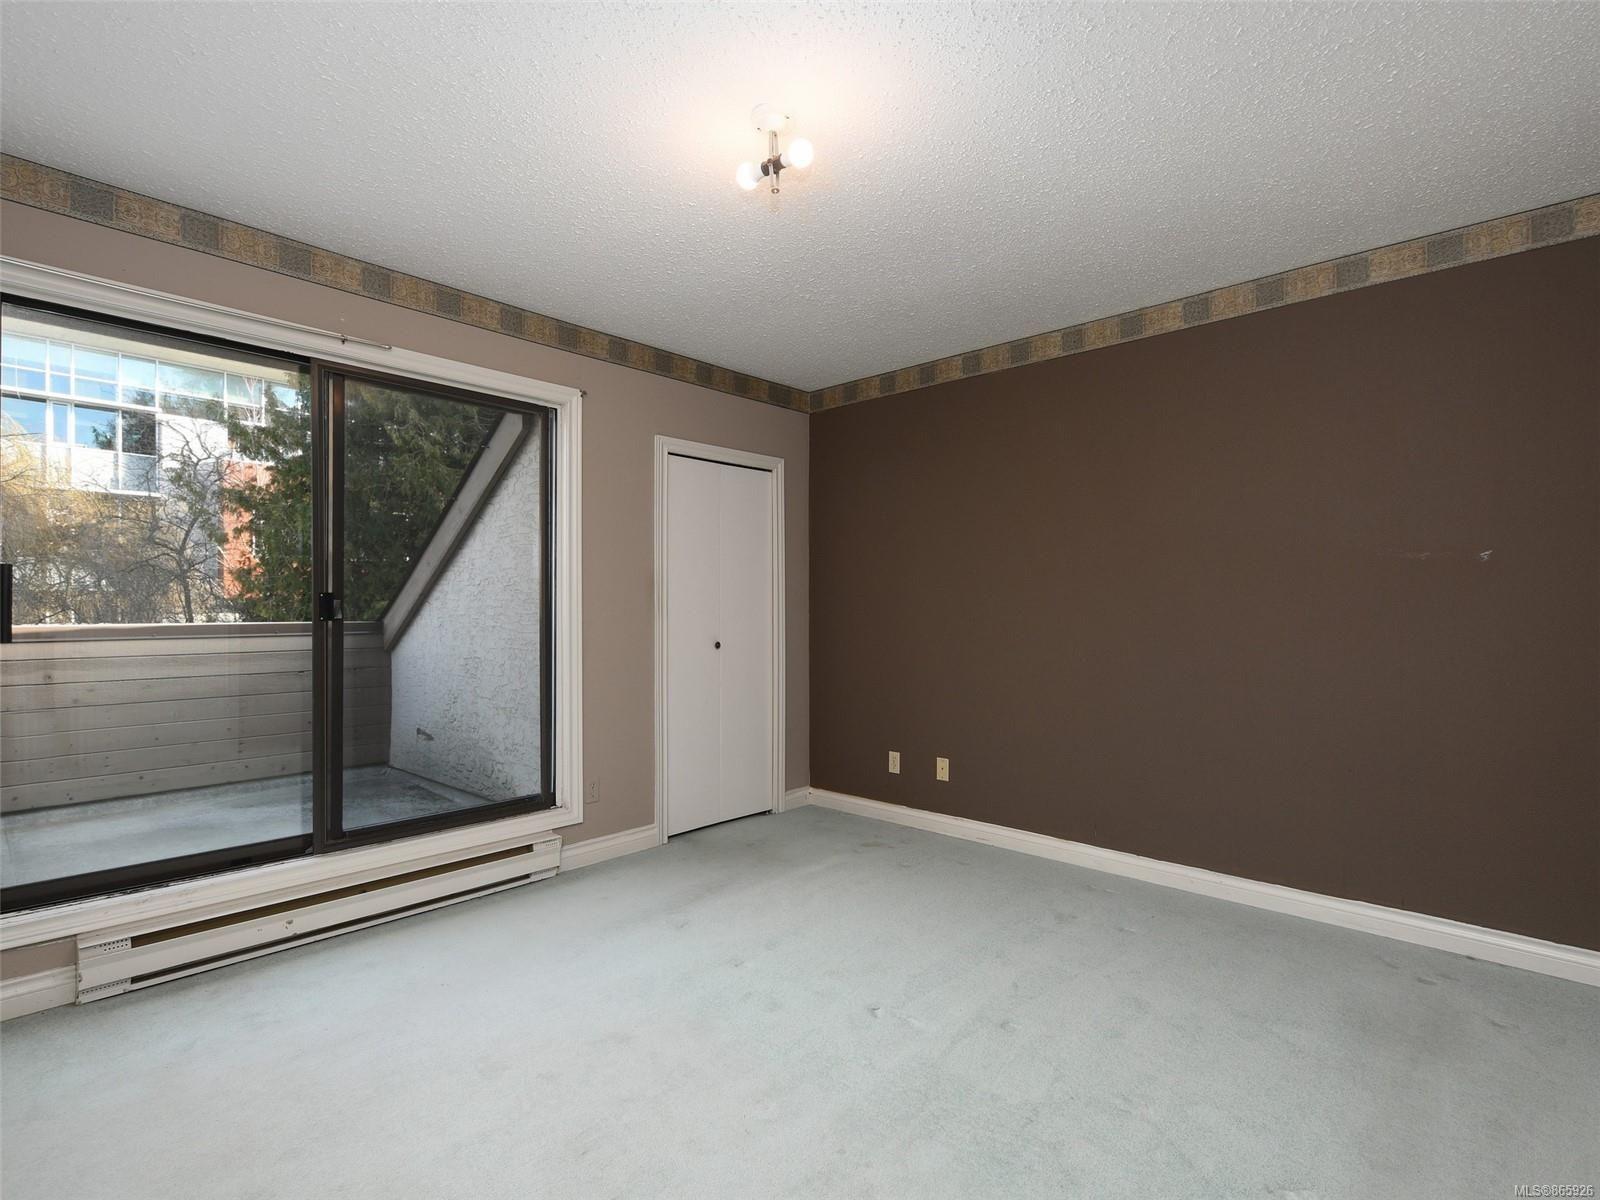 Photo 12: Photos: 8 4350 West Saanich Rd in : SW Royal Oak Row/Townhouse for sale (Saanich West)  : MLS®# 865926